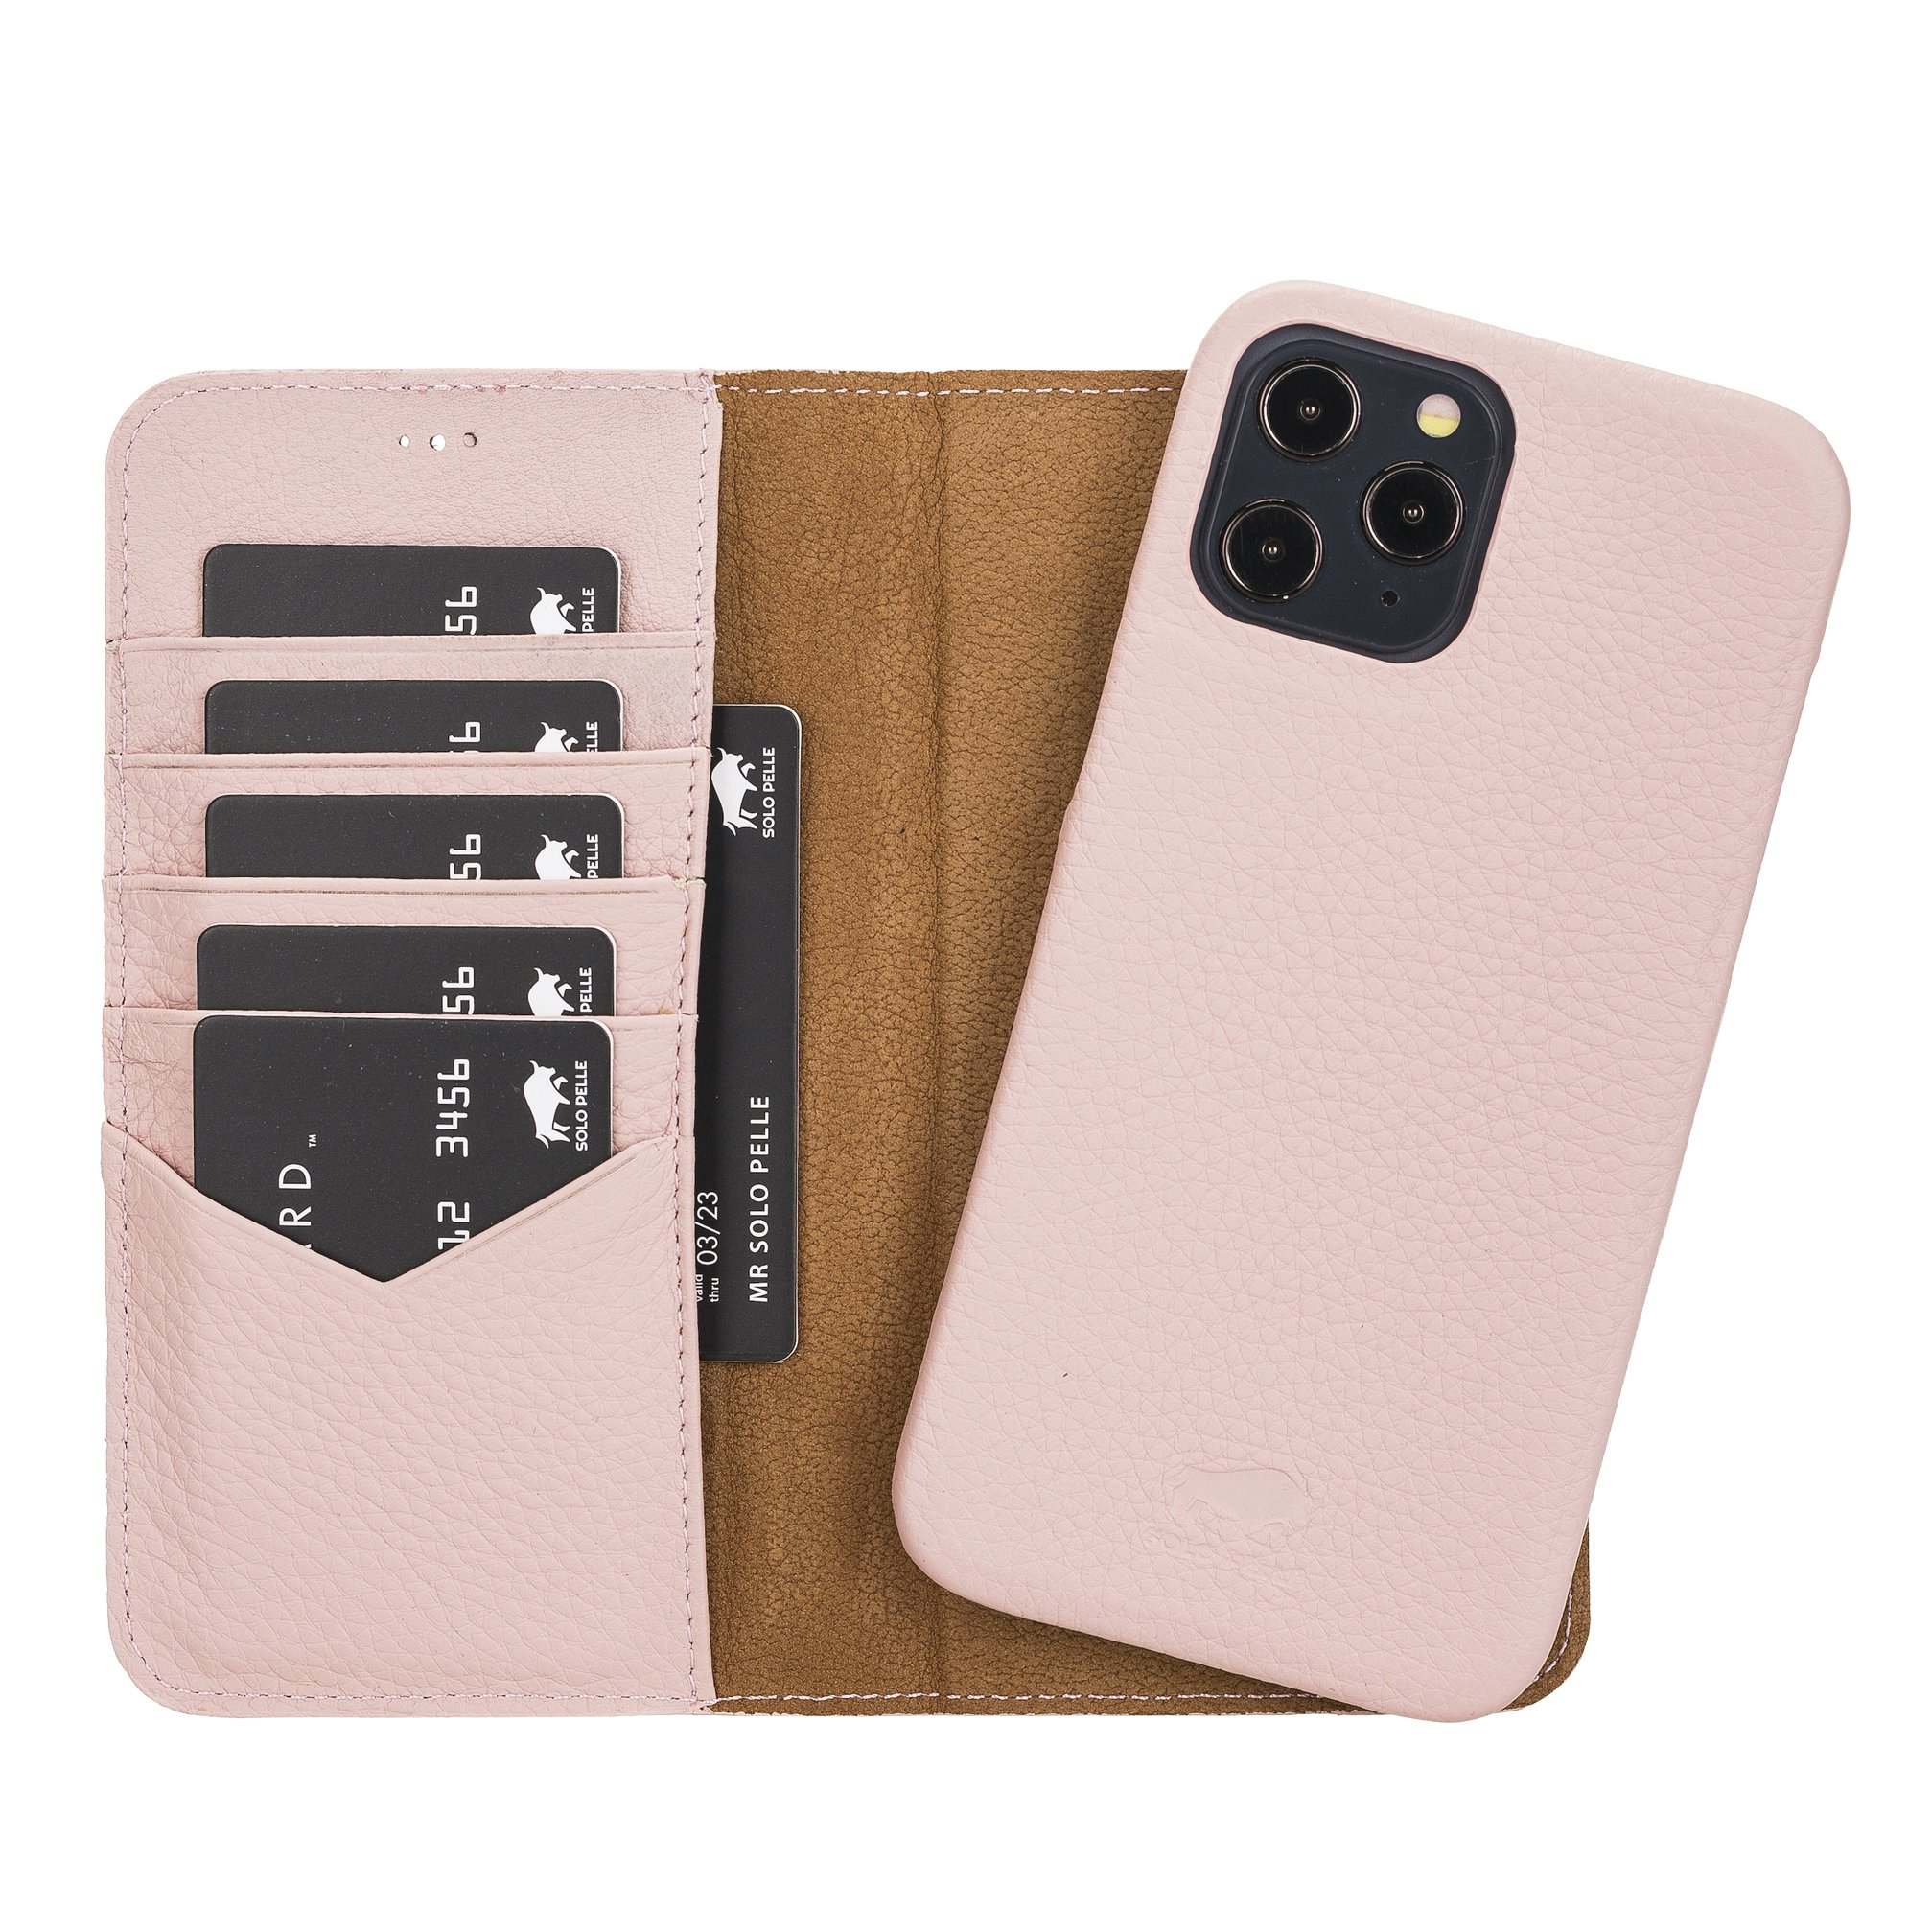 "iPhone 12 & 12 Pro abnehmbare Lederhülle ""Clemson"" MagSafe kompatibel (Vollleder Nude Rosa)"